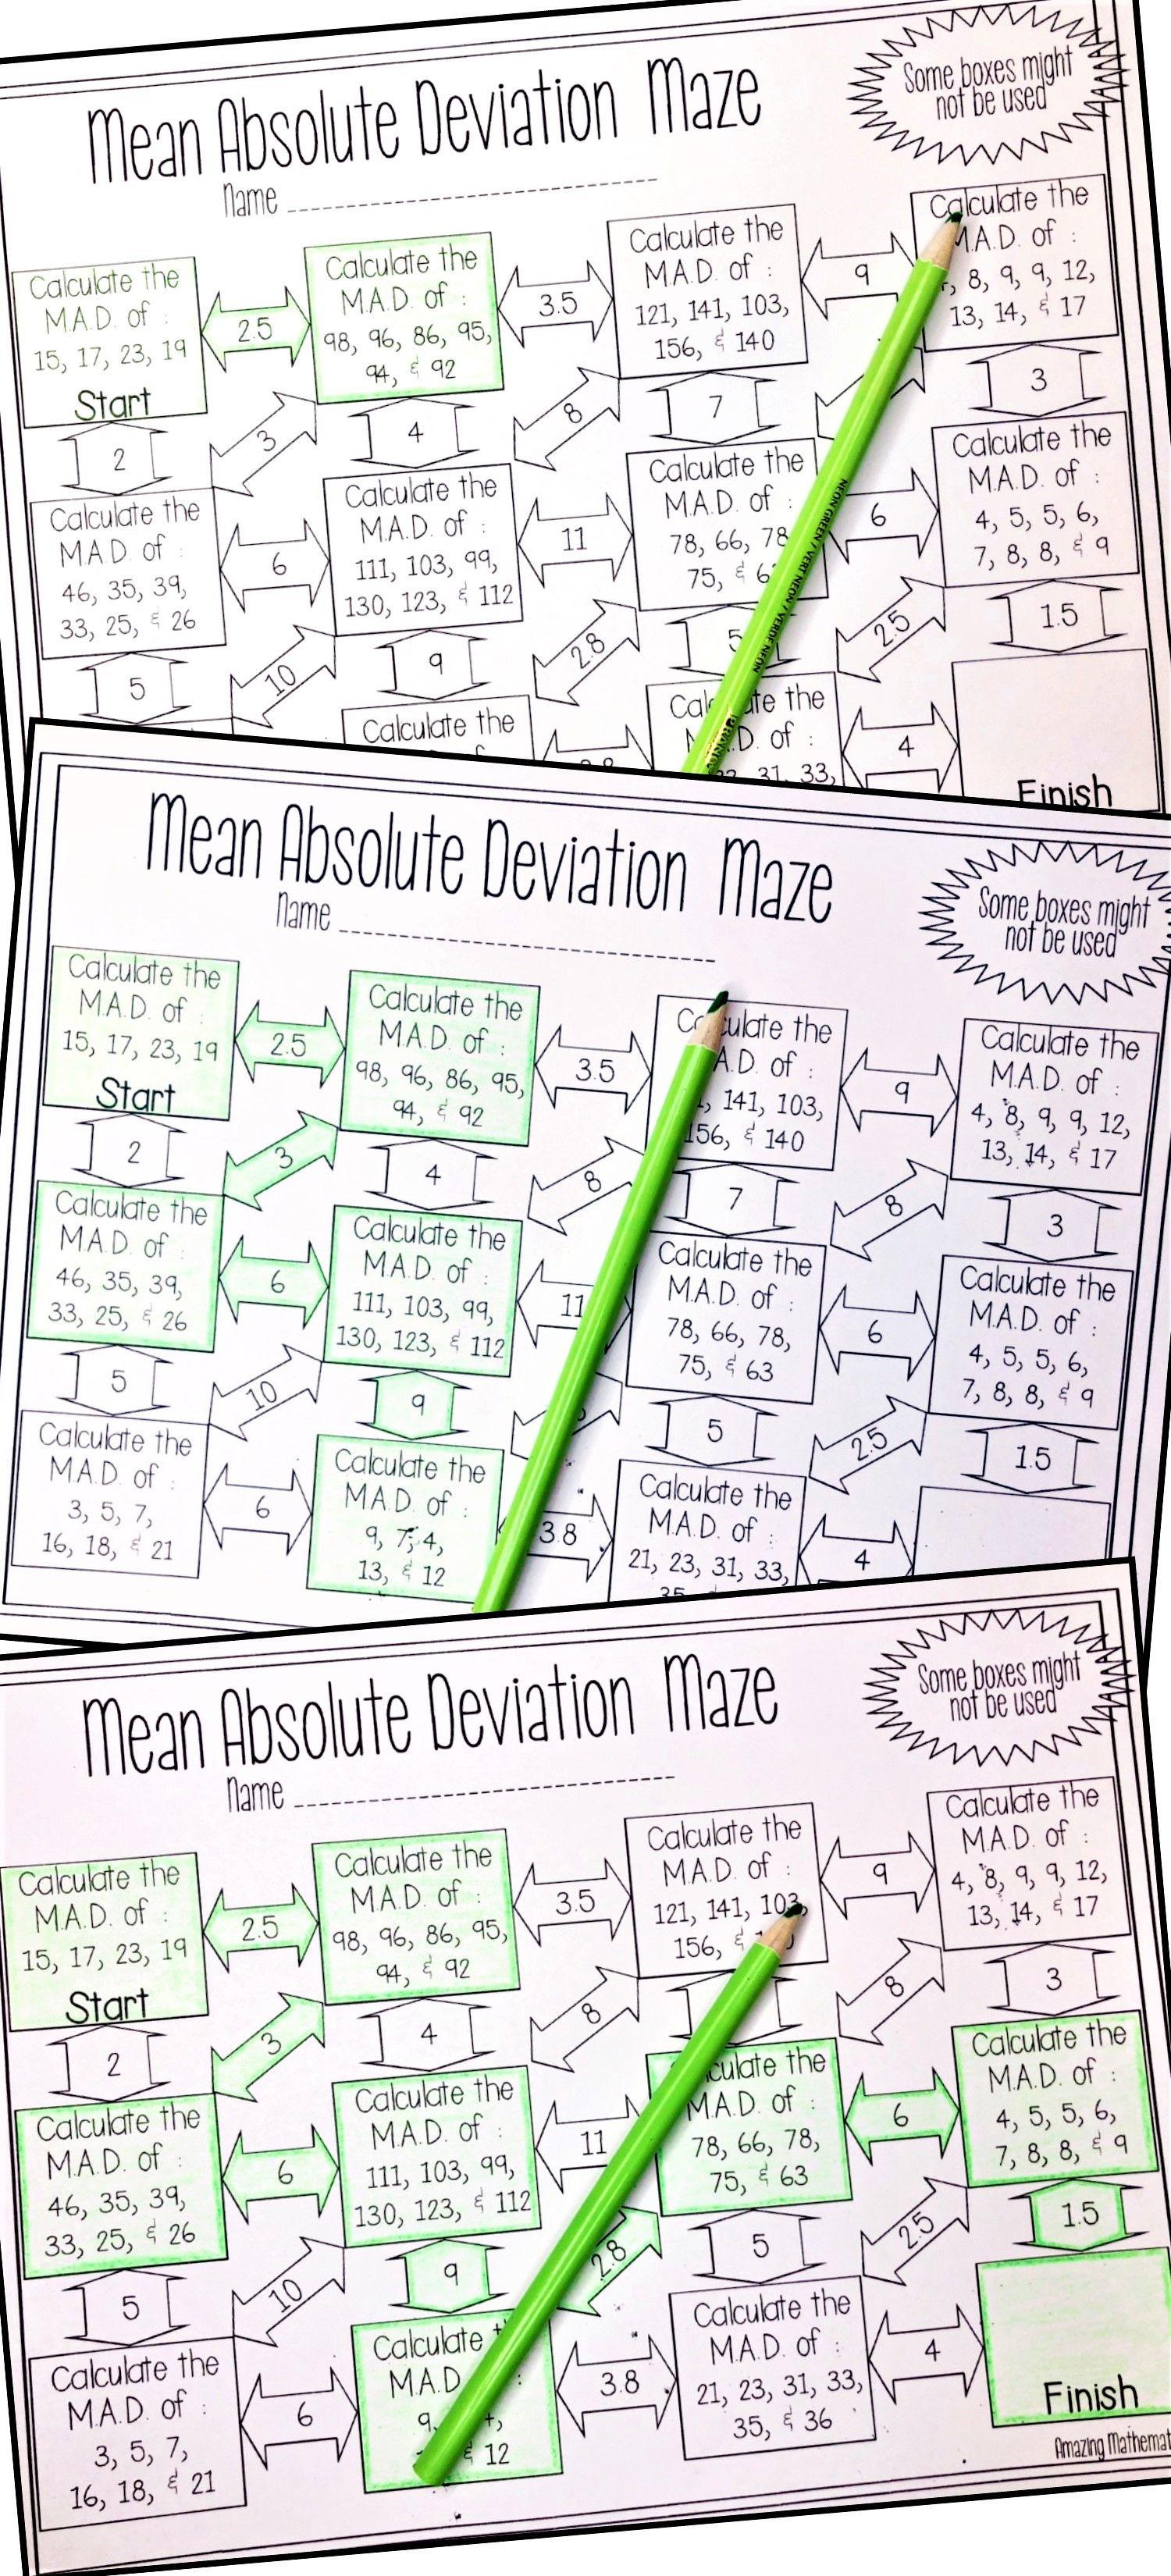 Mean Absolute Deviation Worksheet Maze Activity Math Worksheets 8th Grade Math Worksheets 8th Grade Math [ 3300 x 1500 Pixel ]